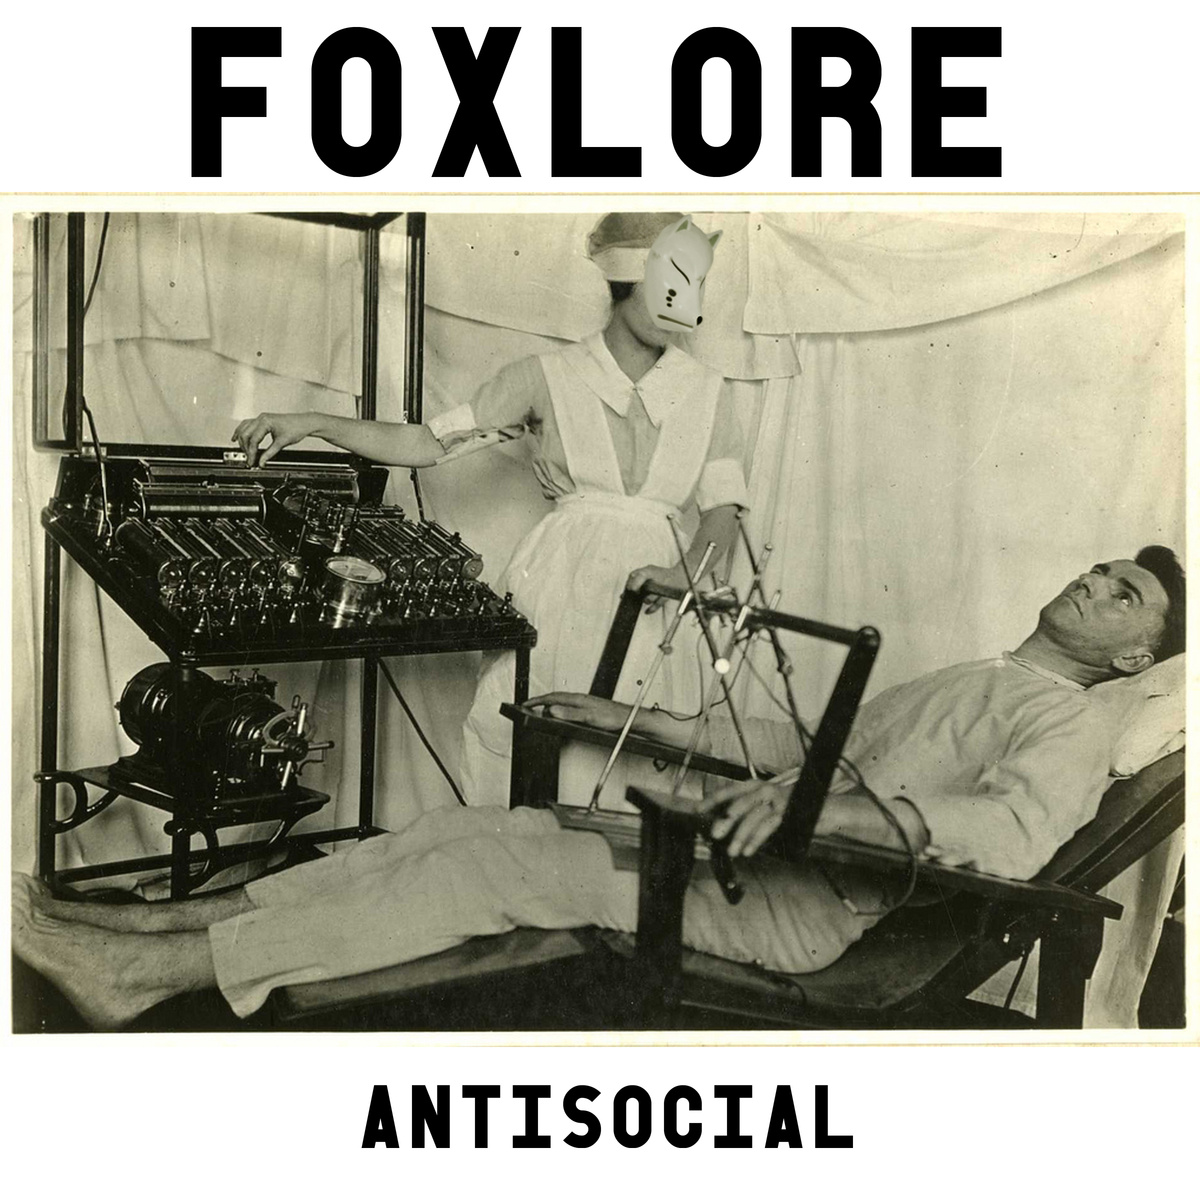 foxlore.jpg